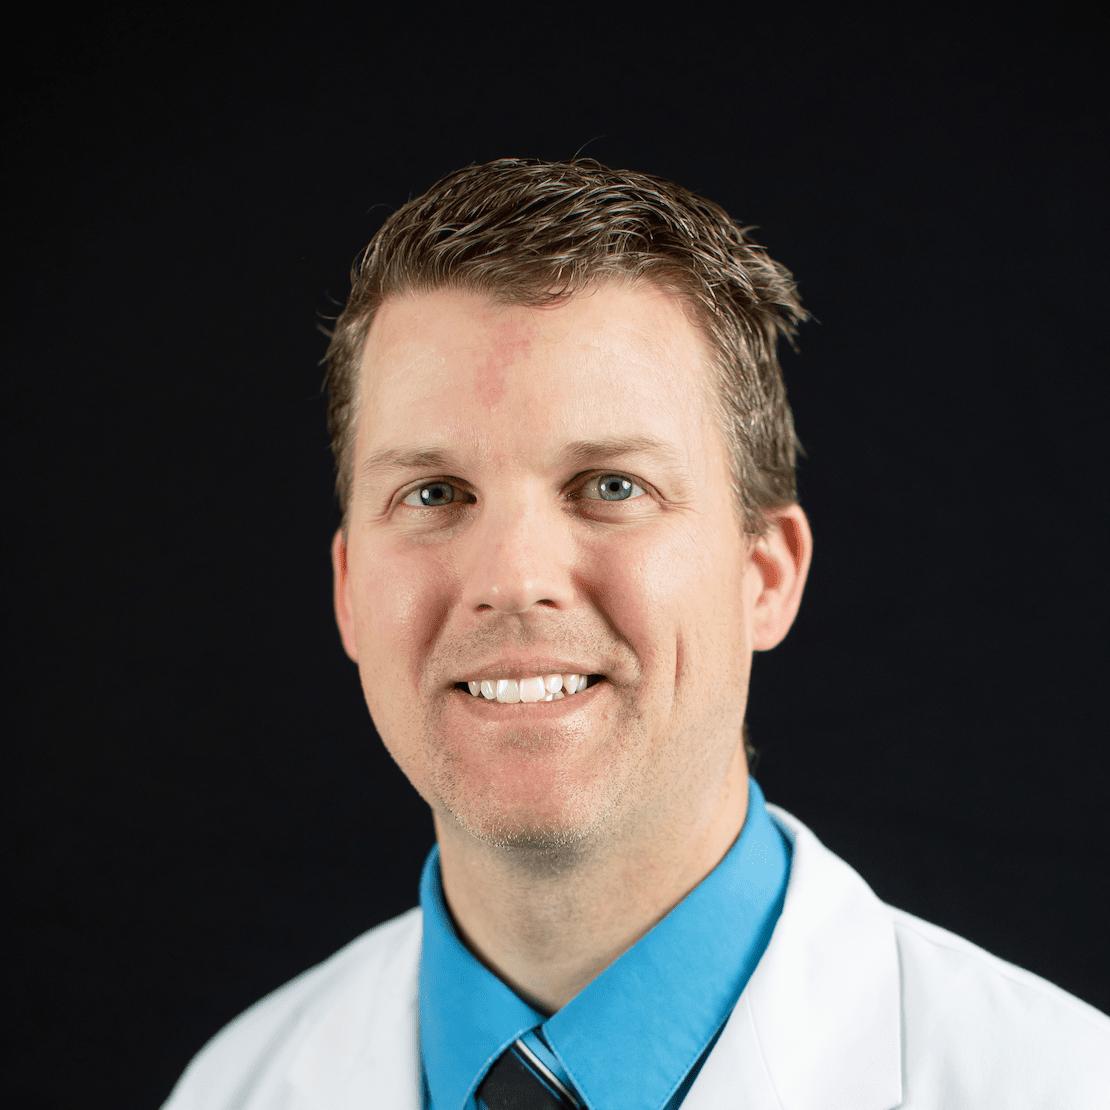 Dr. Ben Taylor